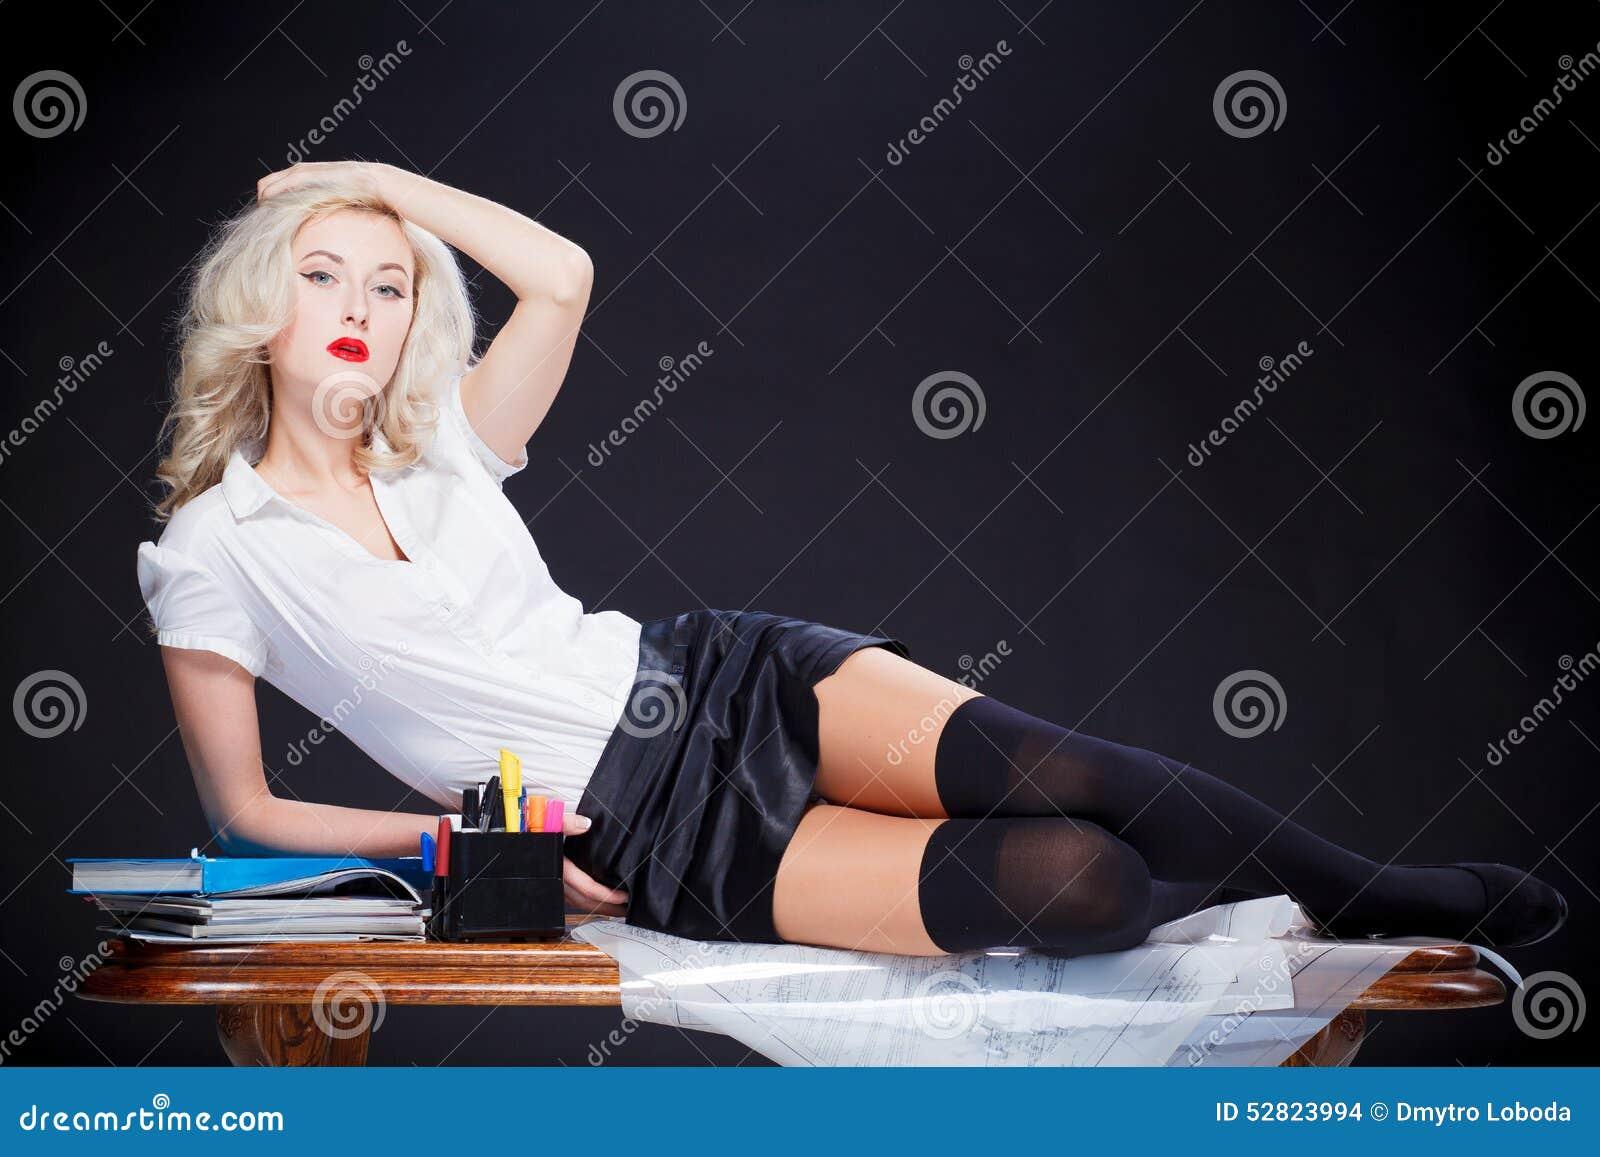 sexy naked girls humping teacher